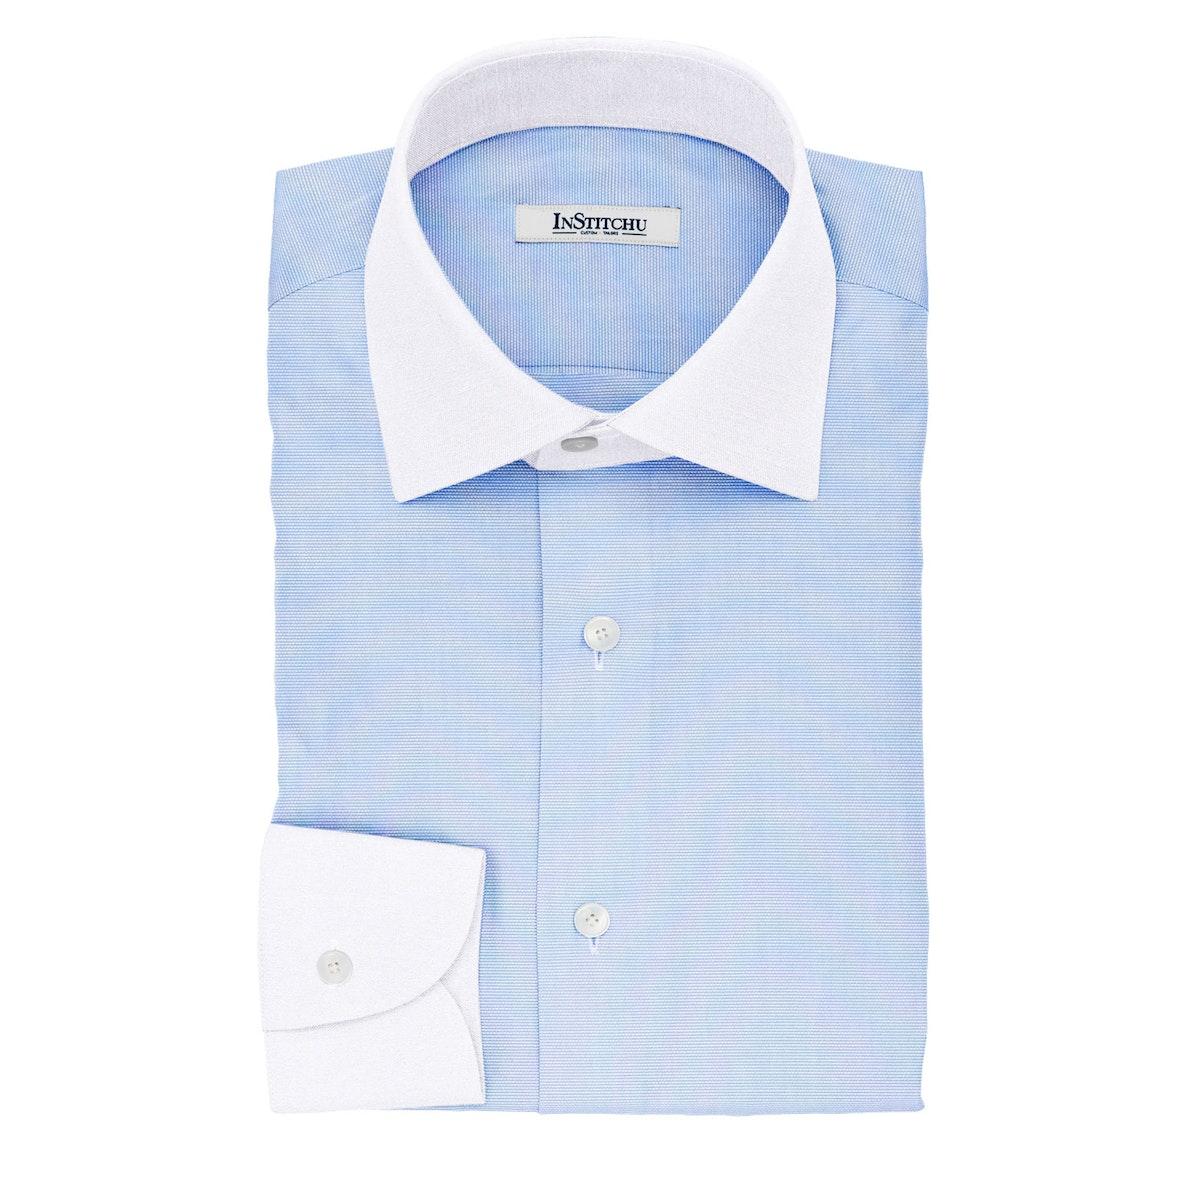 InStitchu Collection The Fox Textured Blue Cotton Banker Shirt